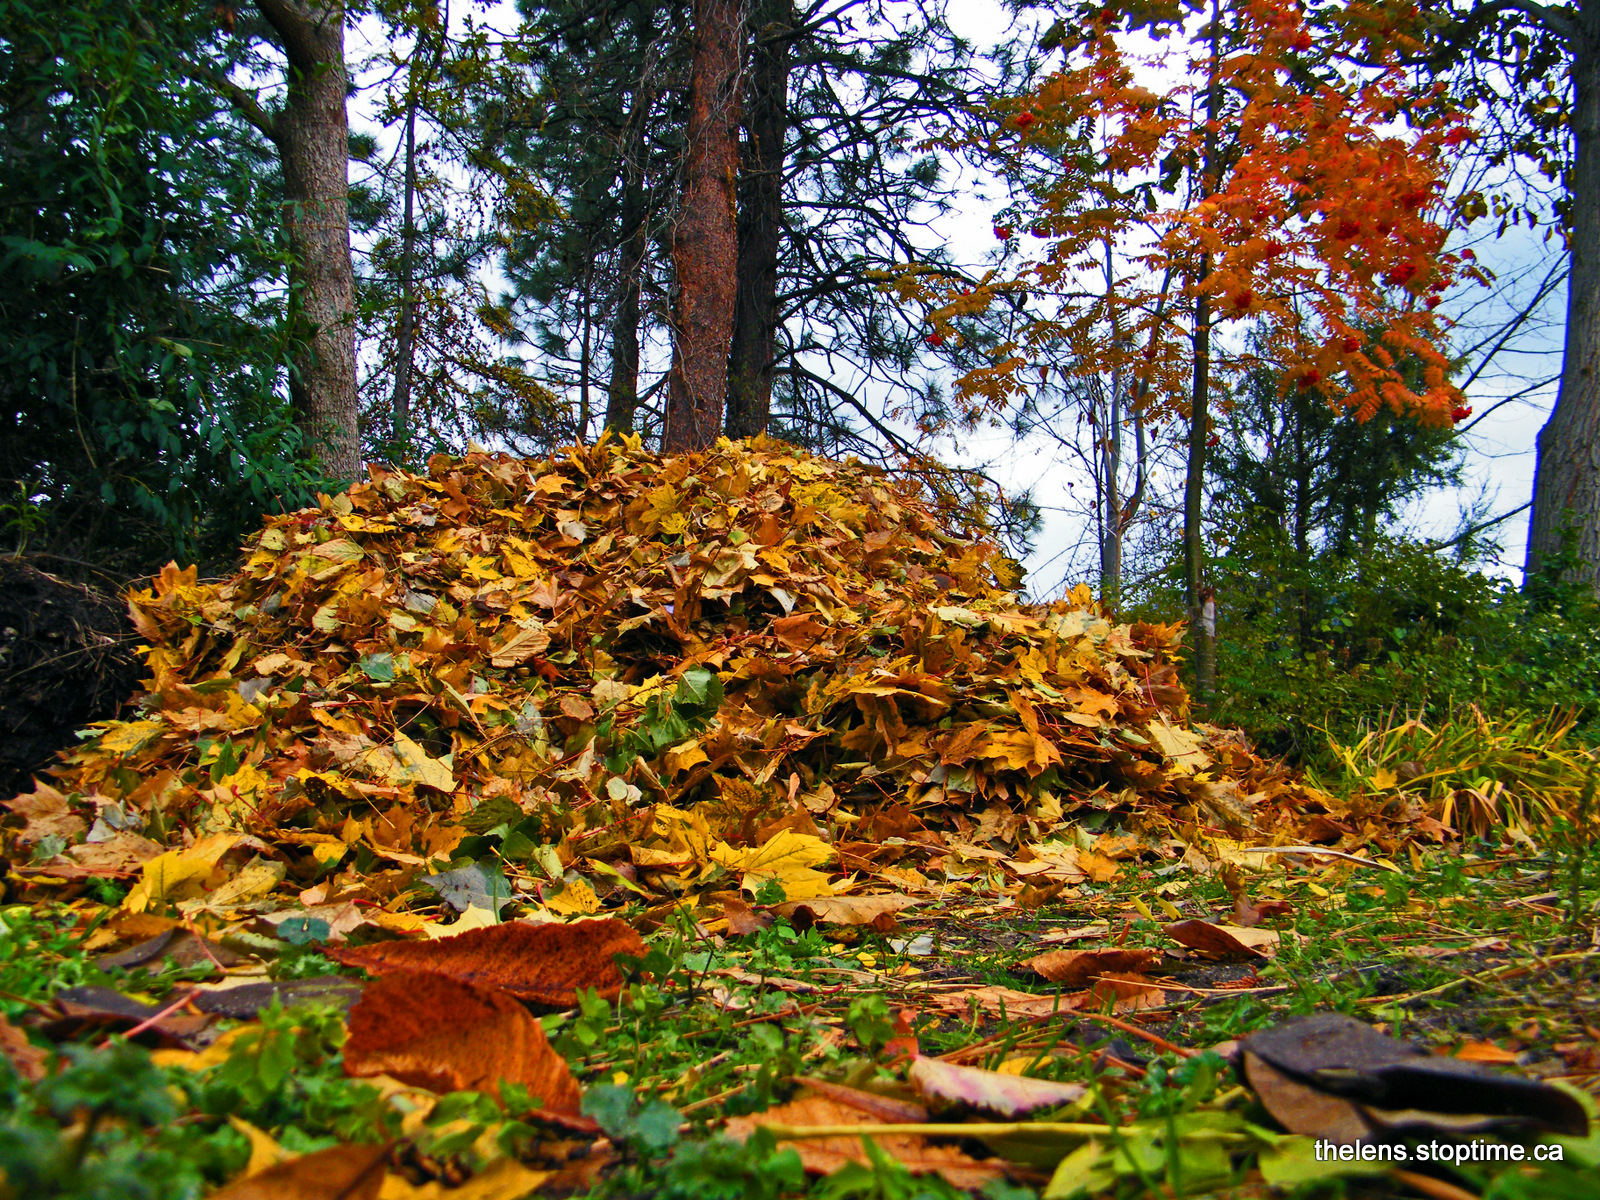 Pileの画像 p1_26